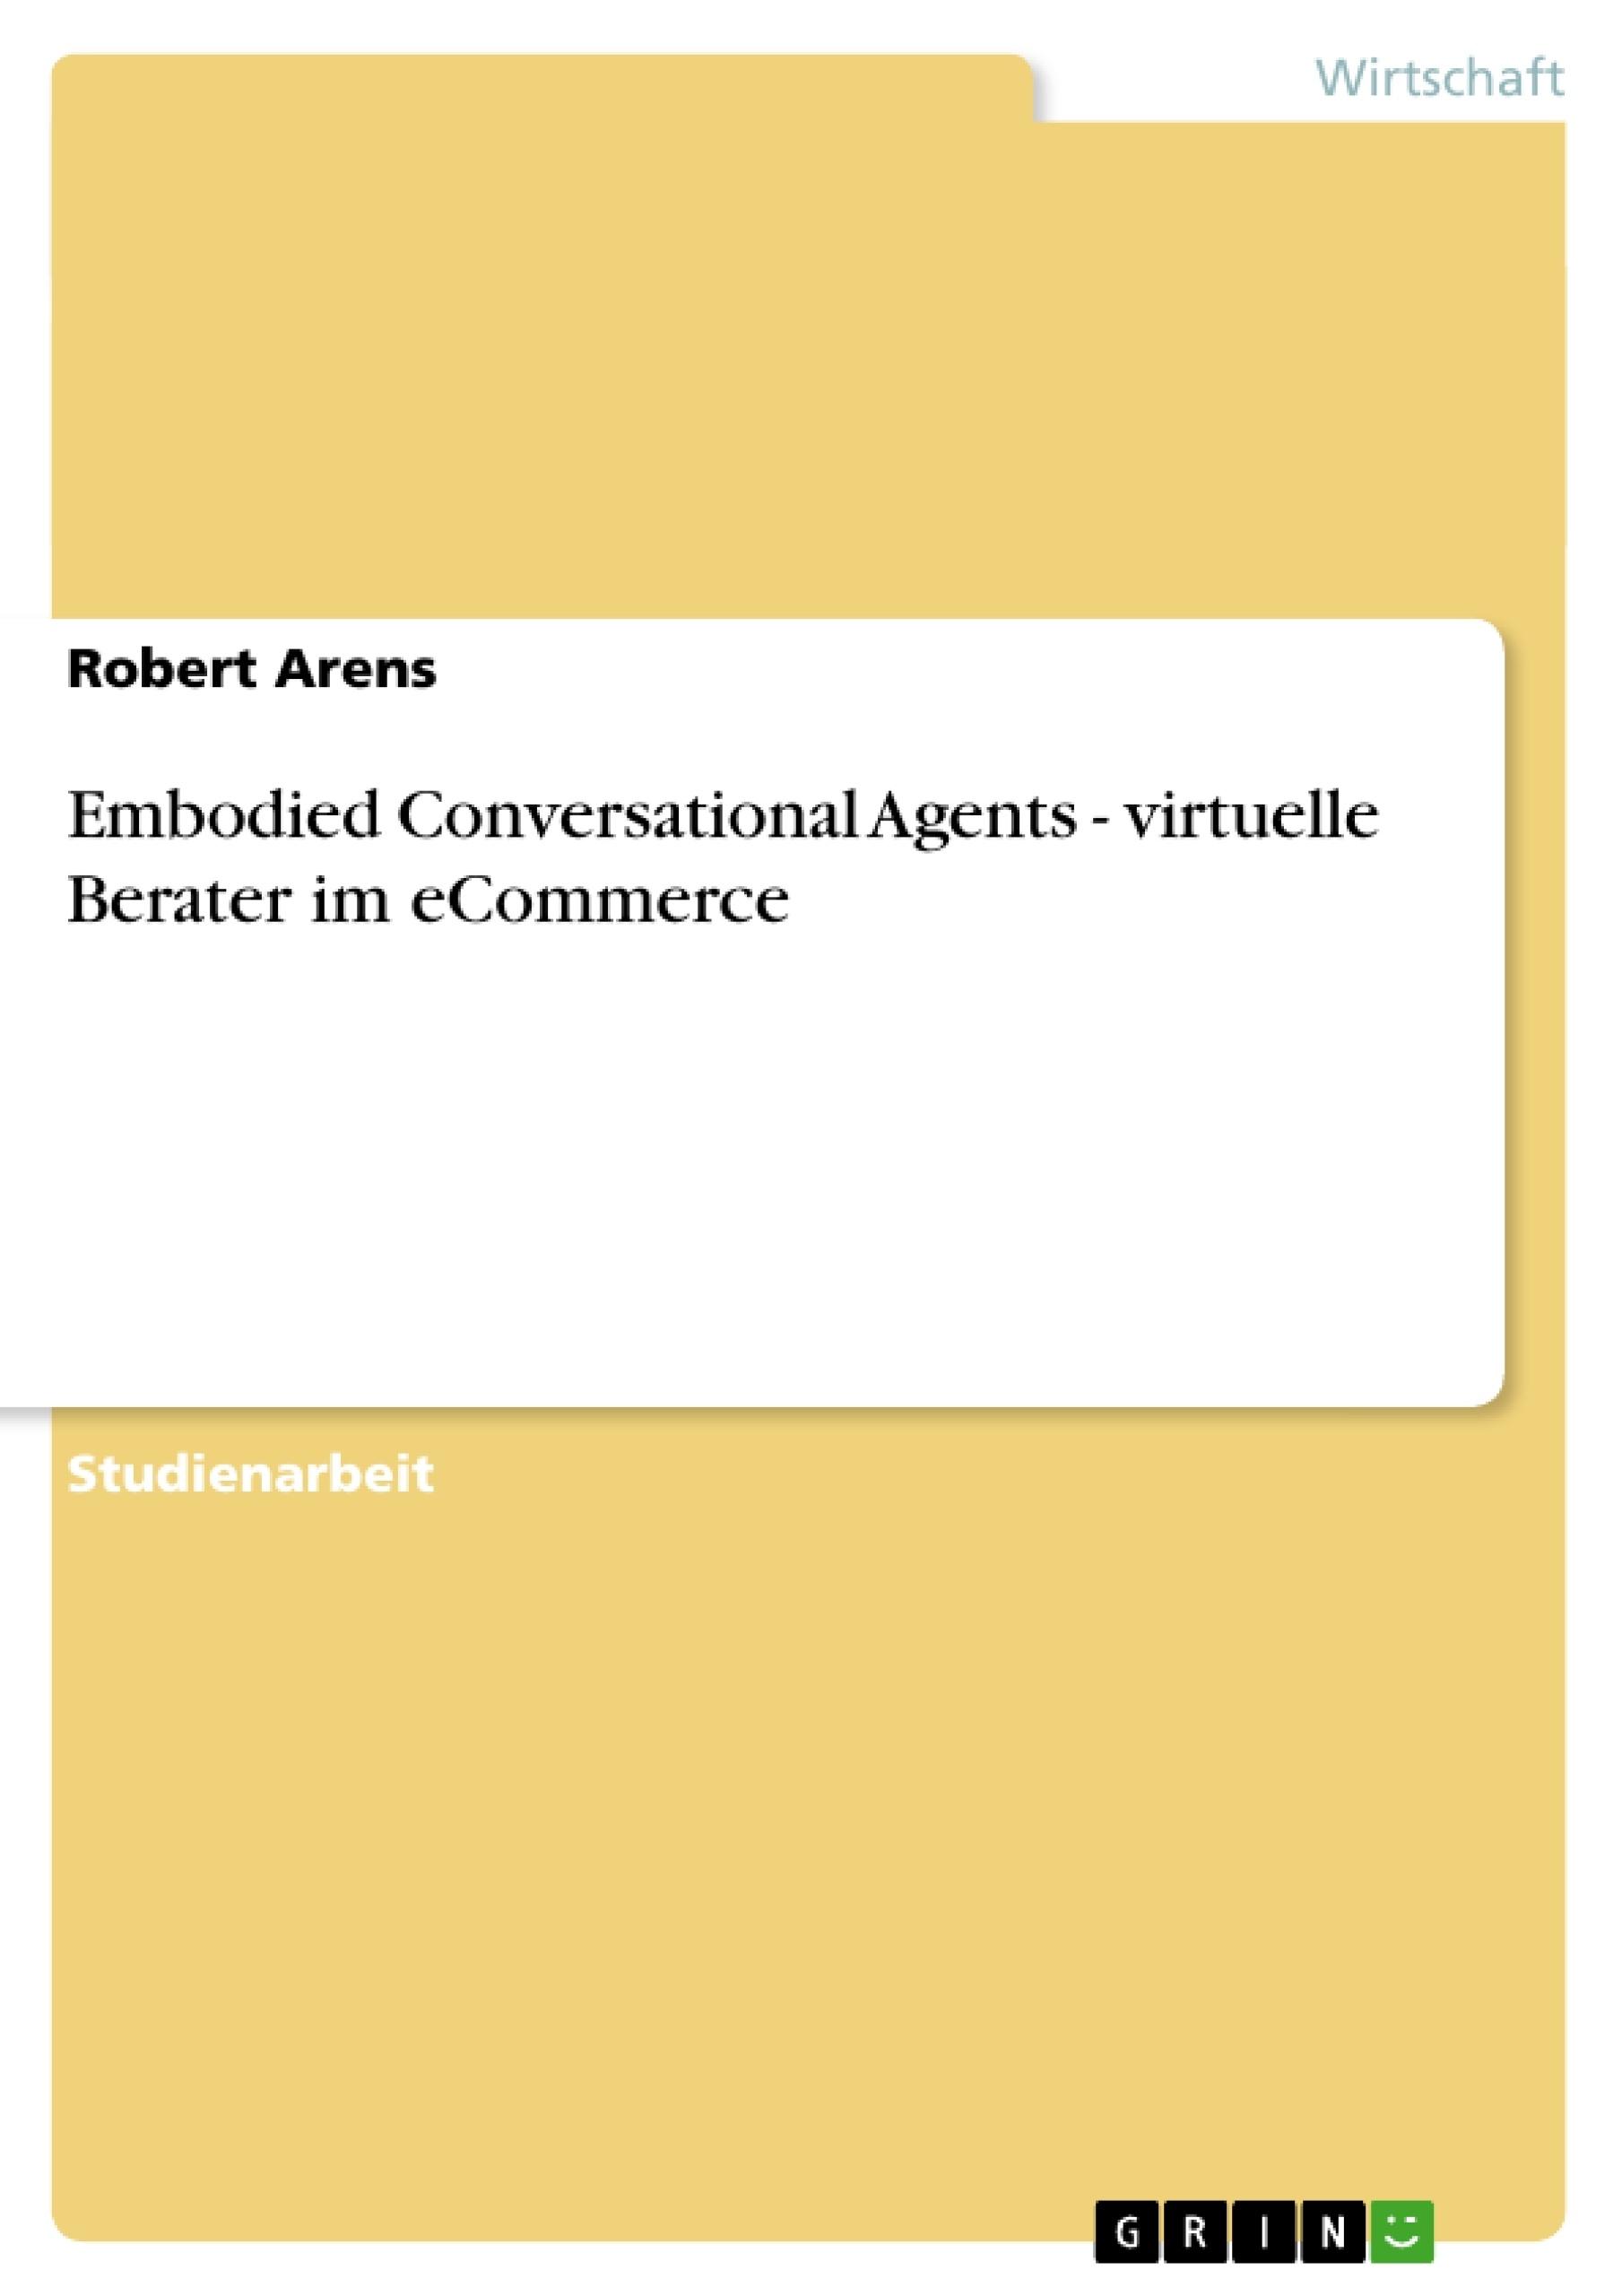 Titel: Embodied Conversational Agents - virtuelle Berater im eCommerce